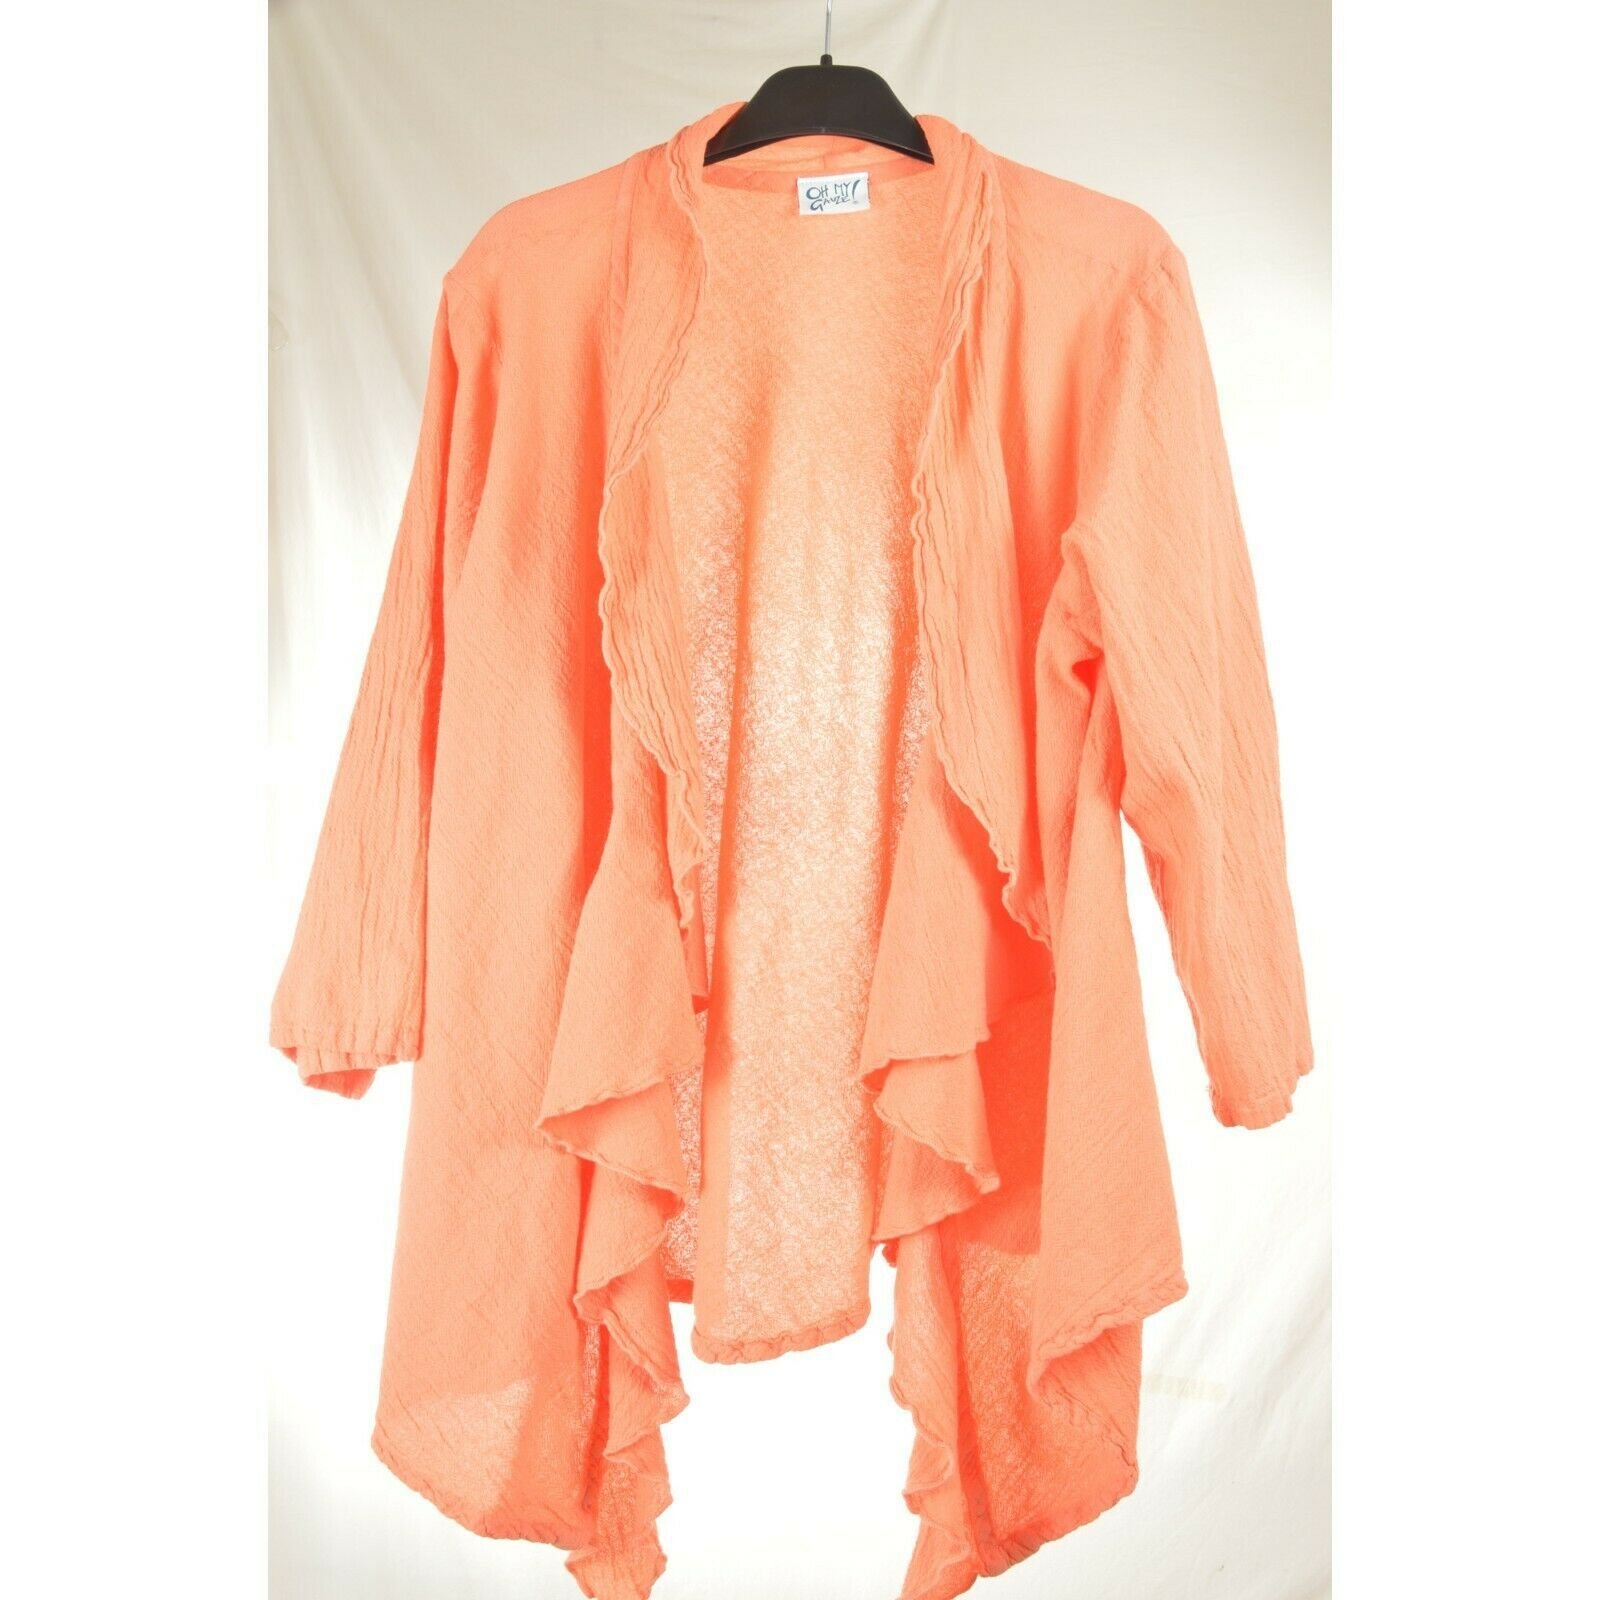 Oh My Gauge jacket cover open OS orange sherbet long sleeve ruffle front hi lo image 9